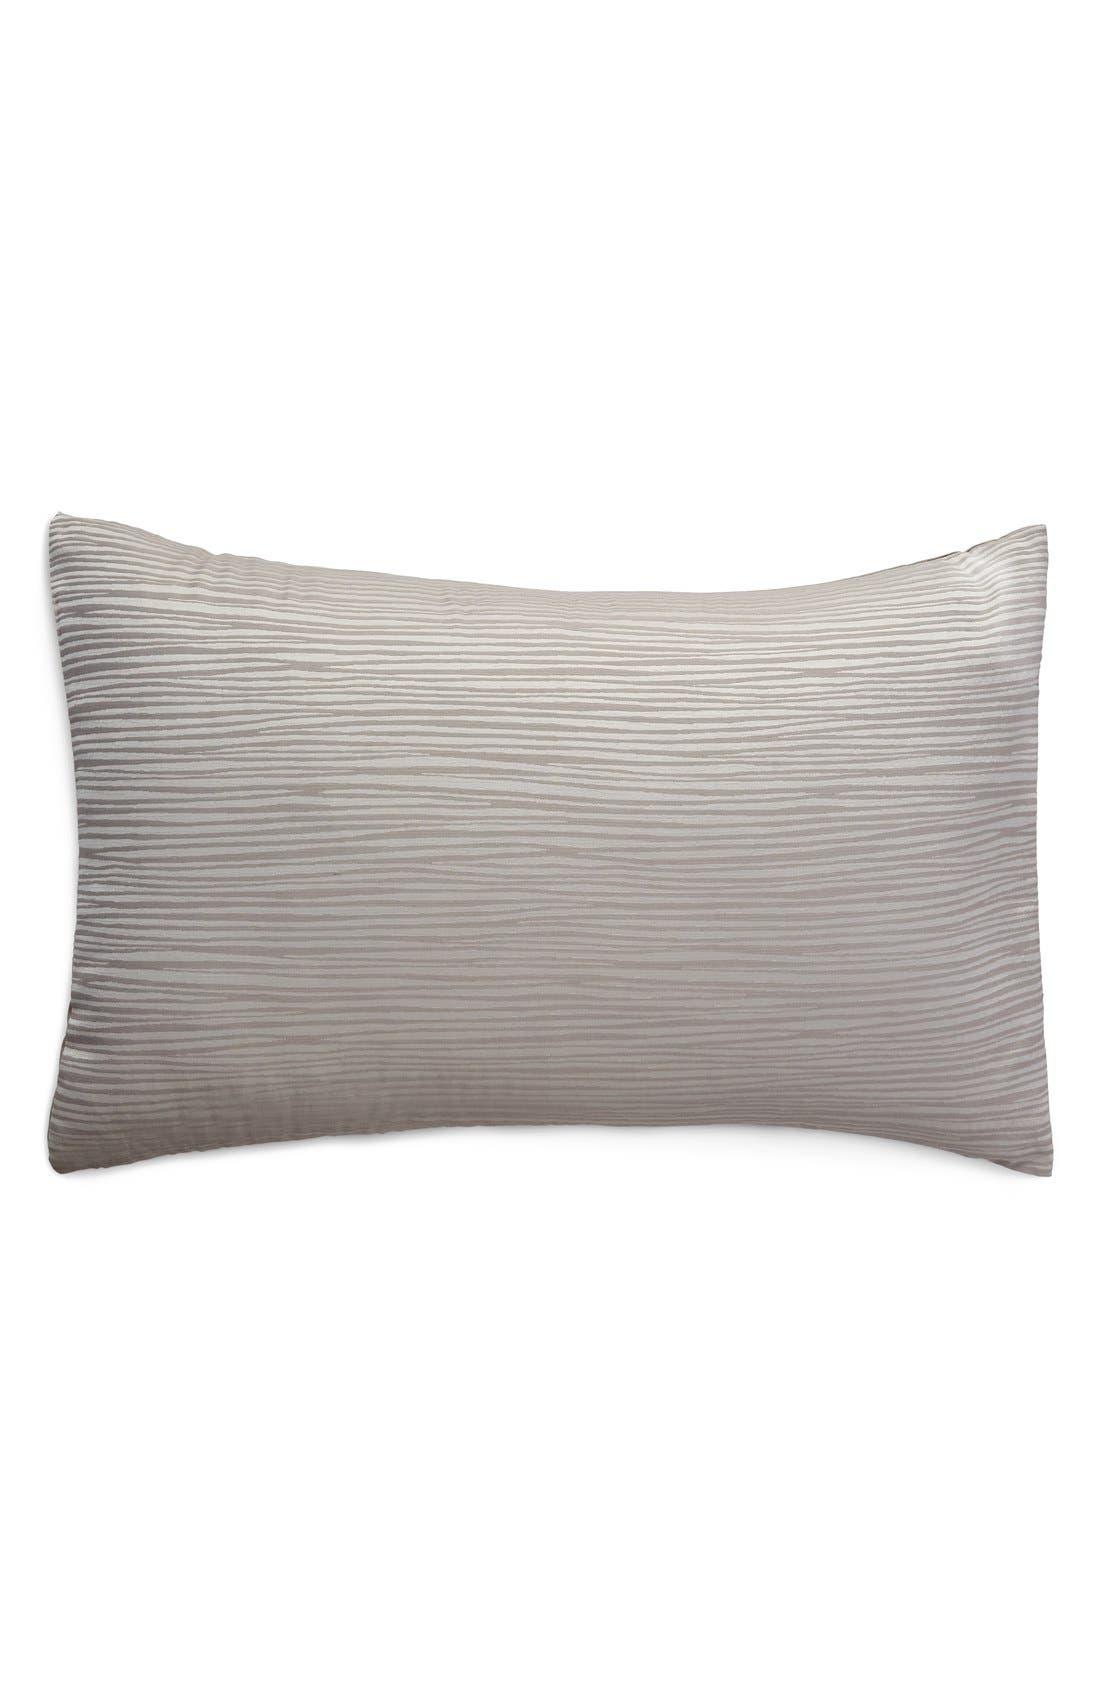 Donna Karan Collection 'Reflection' Sham,                         Main,                         color, Silver